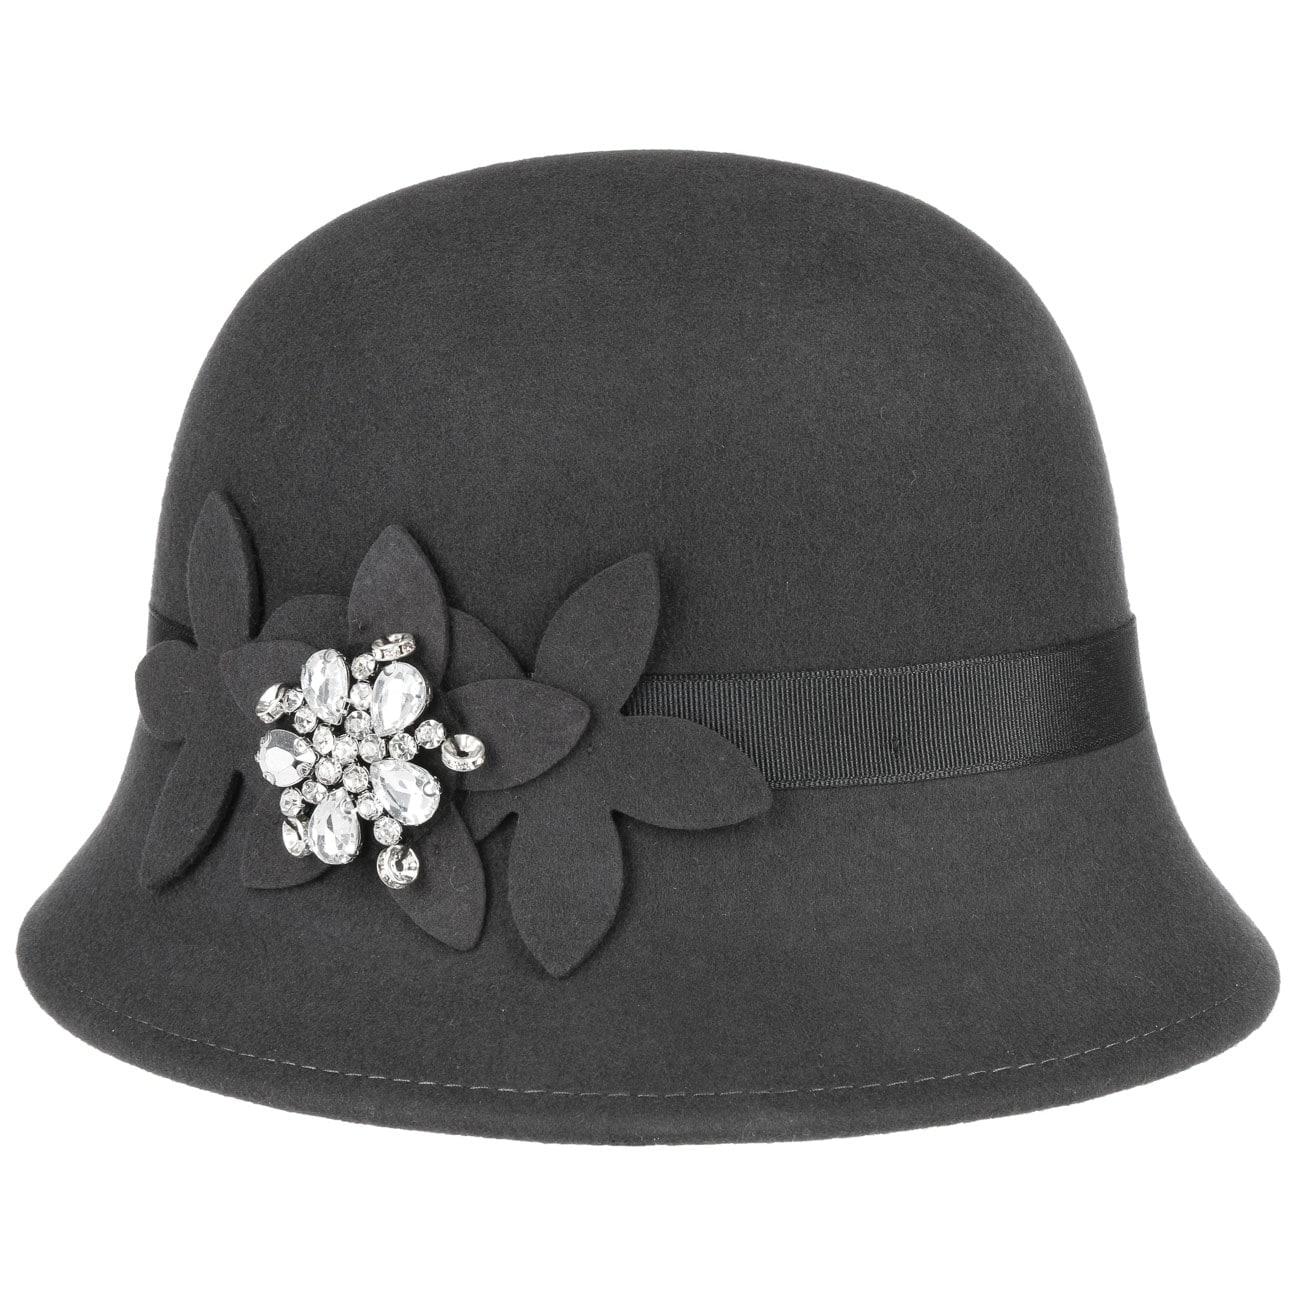 Damenglocke mit Filzblumen und Strass by Lipodo